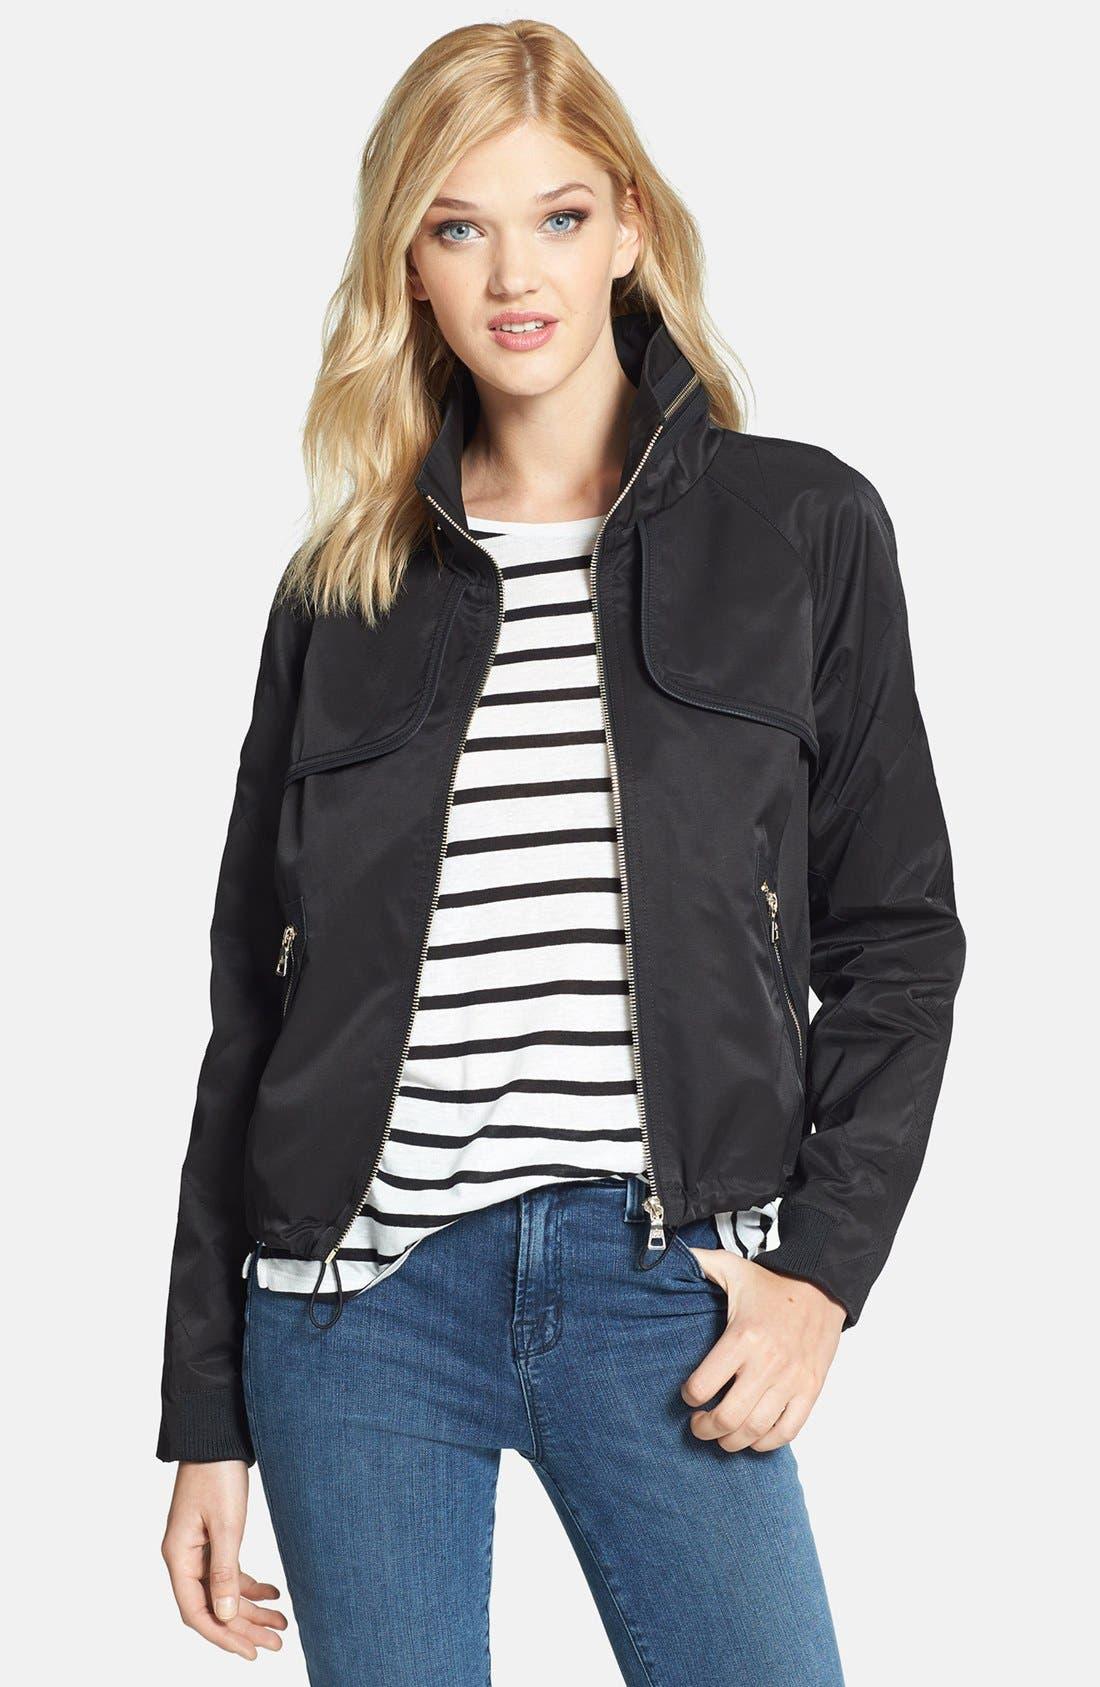 Alternate Image 1 Selected - Sam Edelman 'Stacie' Front Zip Jacket